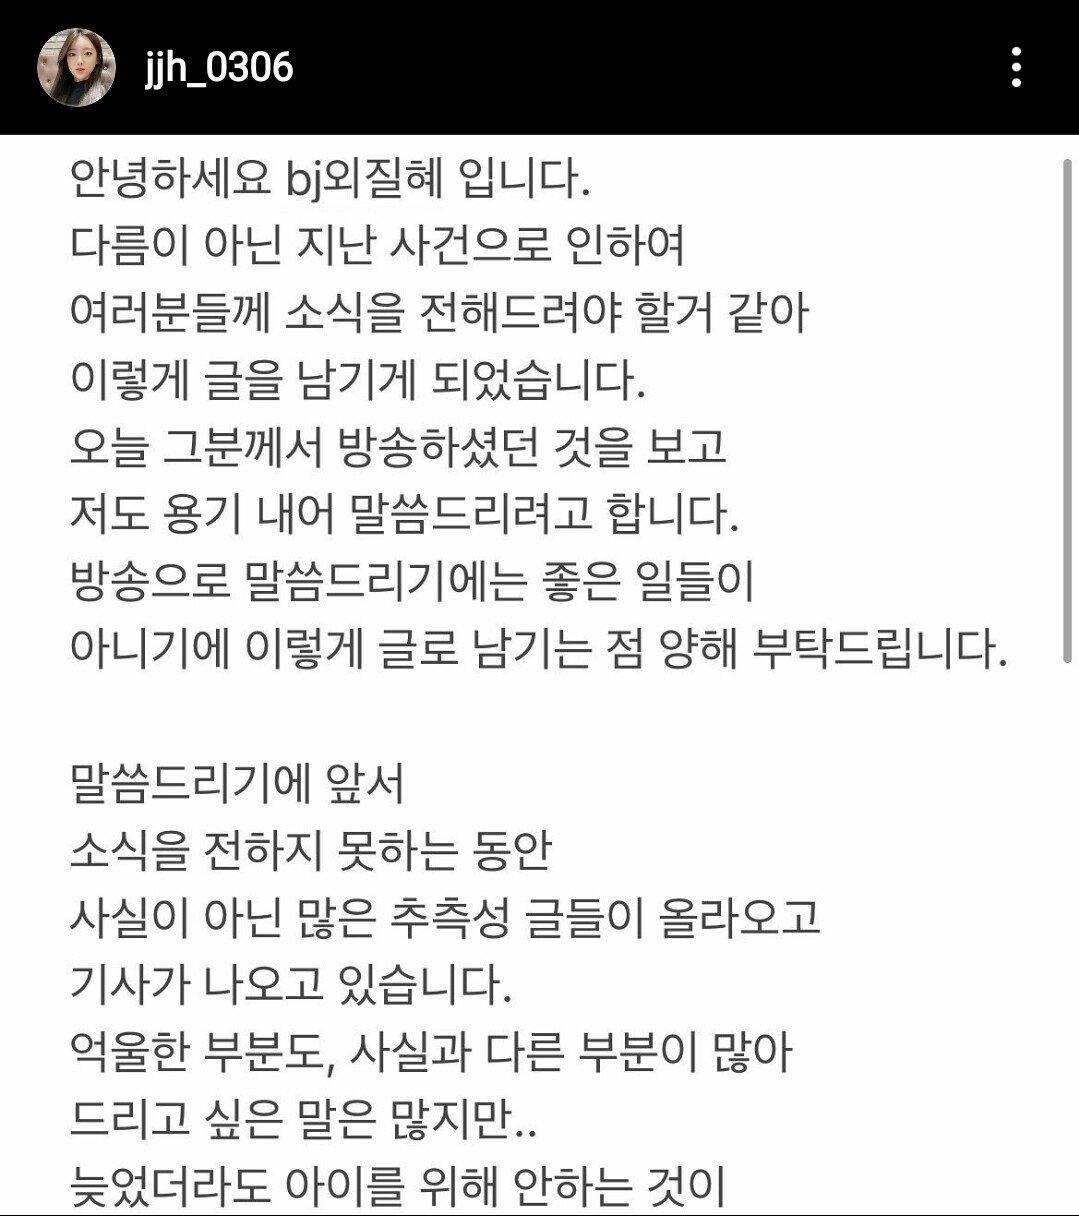 Screenshot_20210616-013101_Instagram.jpg [스압] BJ외질혜 인스타 피드사진 업로드....jpg